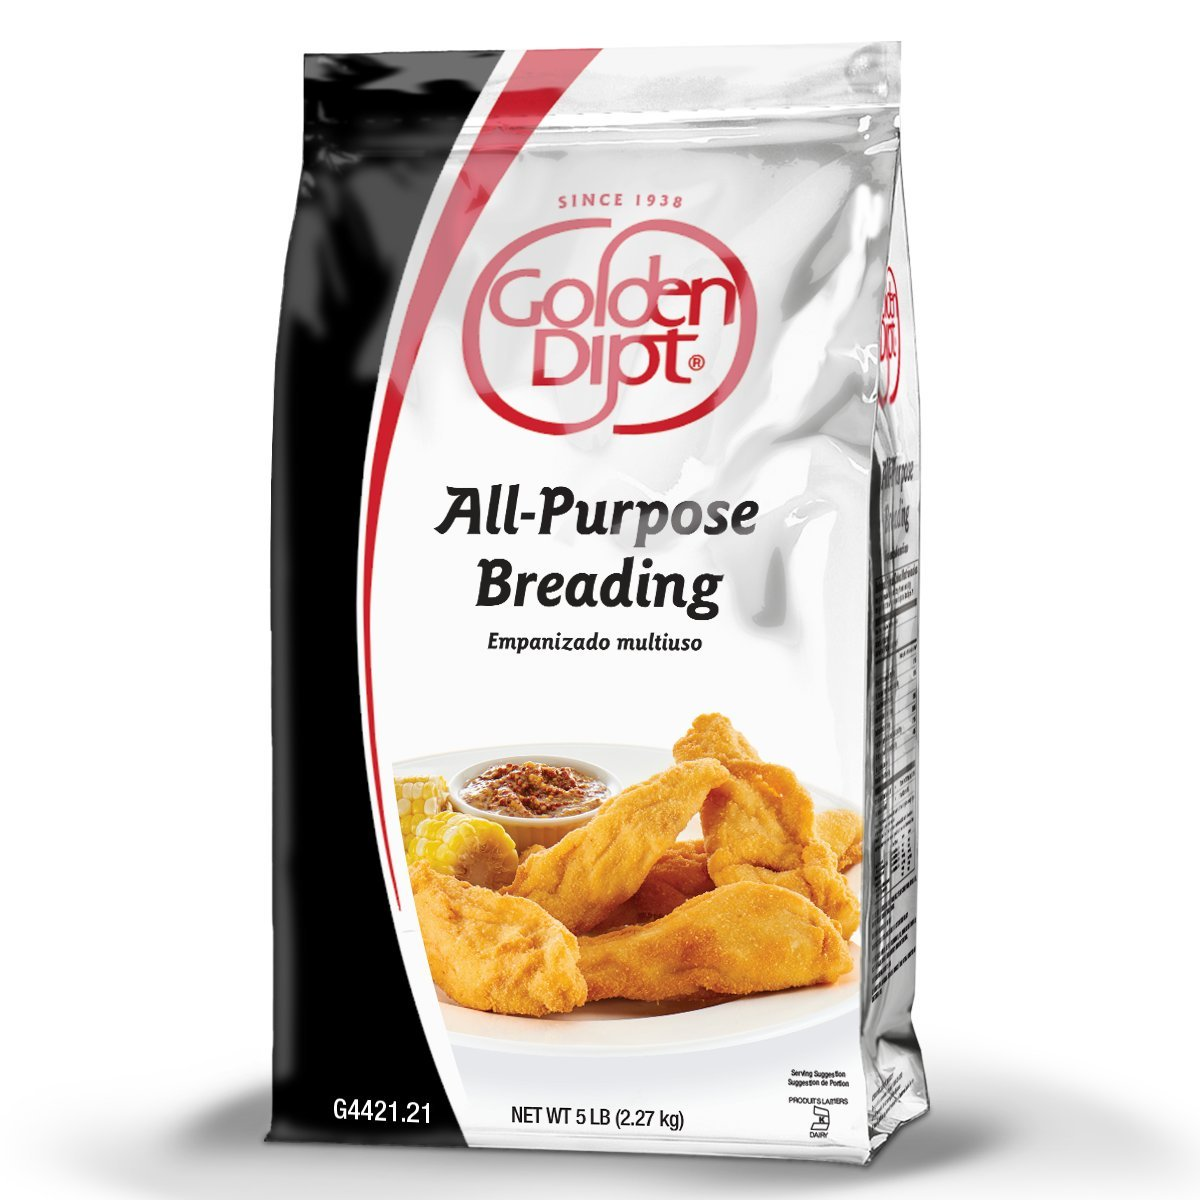 Golden Dipt All-Purpose Breading by Golden Dipt (Image #1)